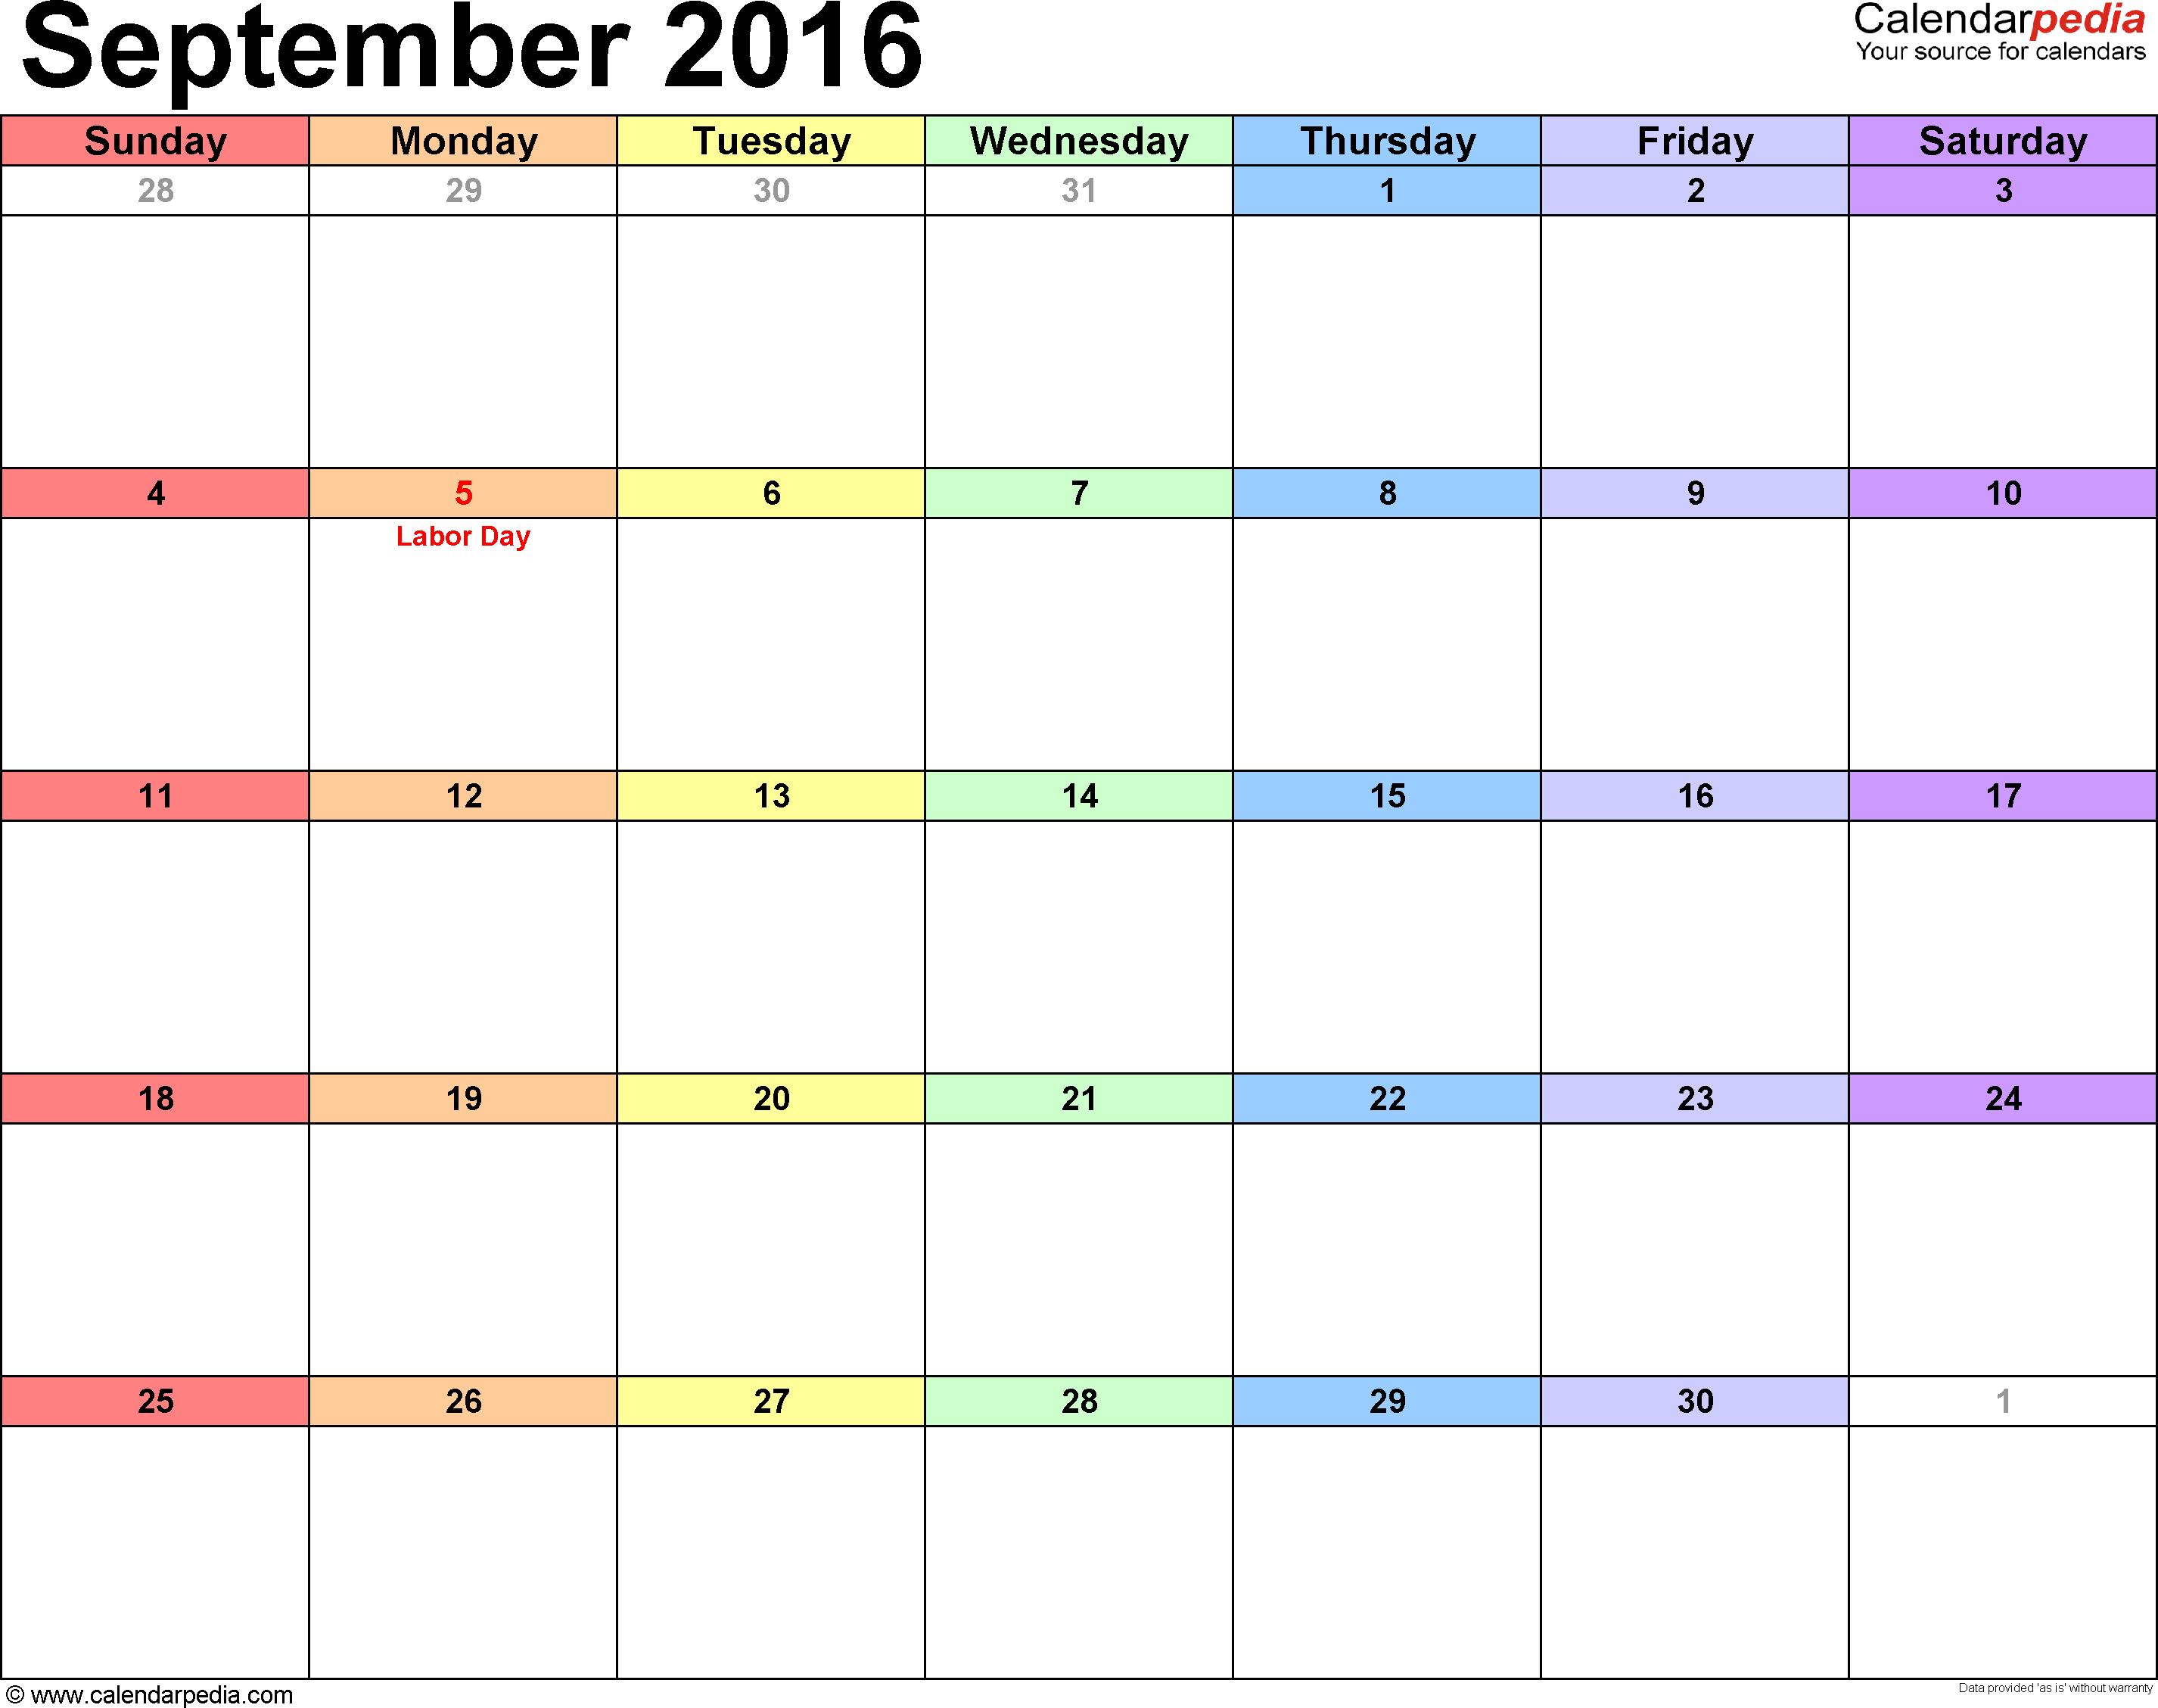 Diy Calendar Excel : September calendars for word excel pdf diy and